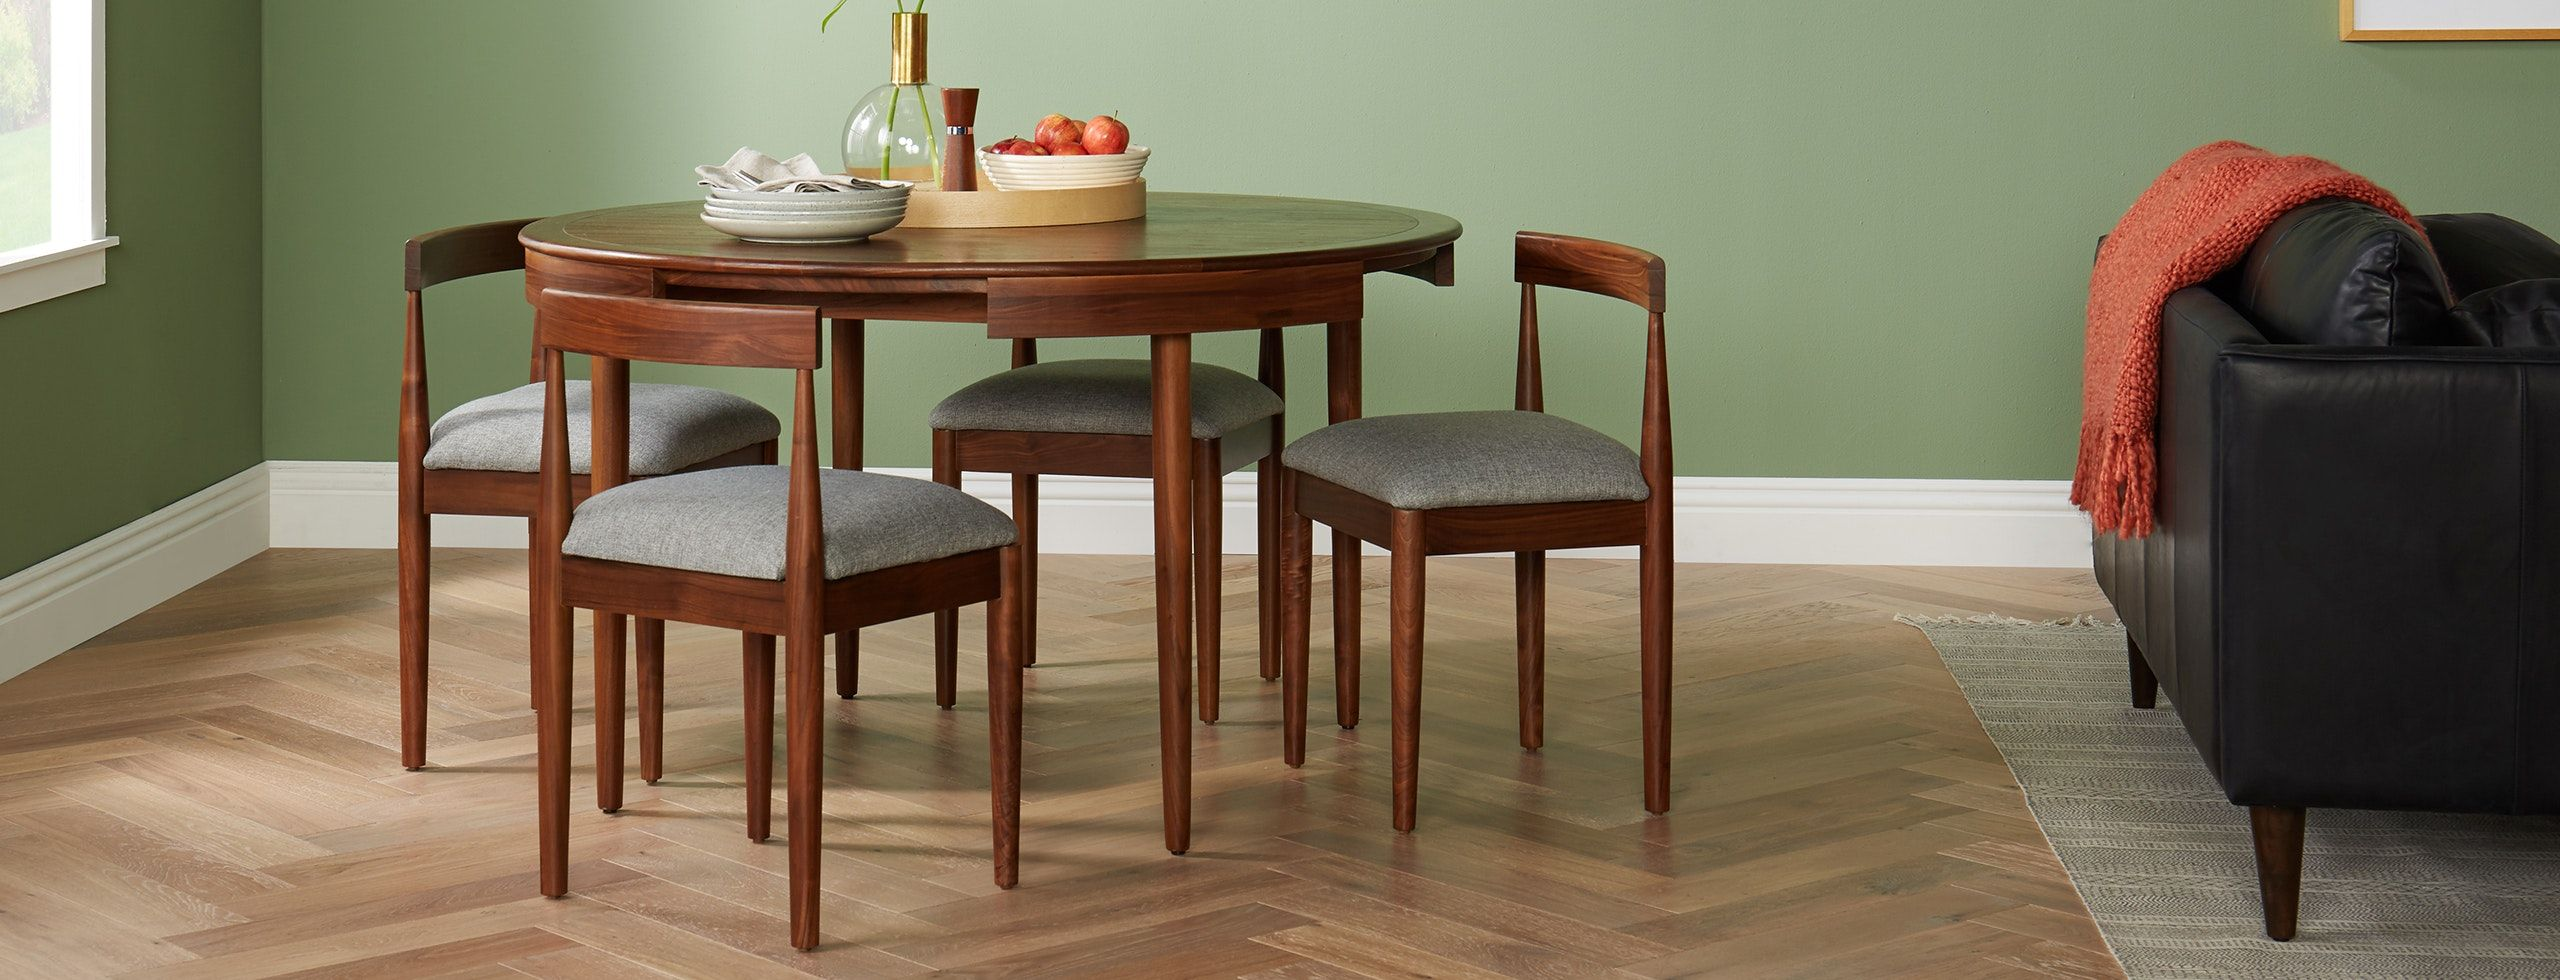 Toscano Dining Set Joybird Mid Century Modern Dining Room Table